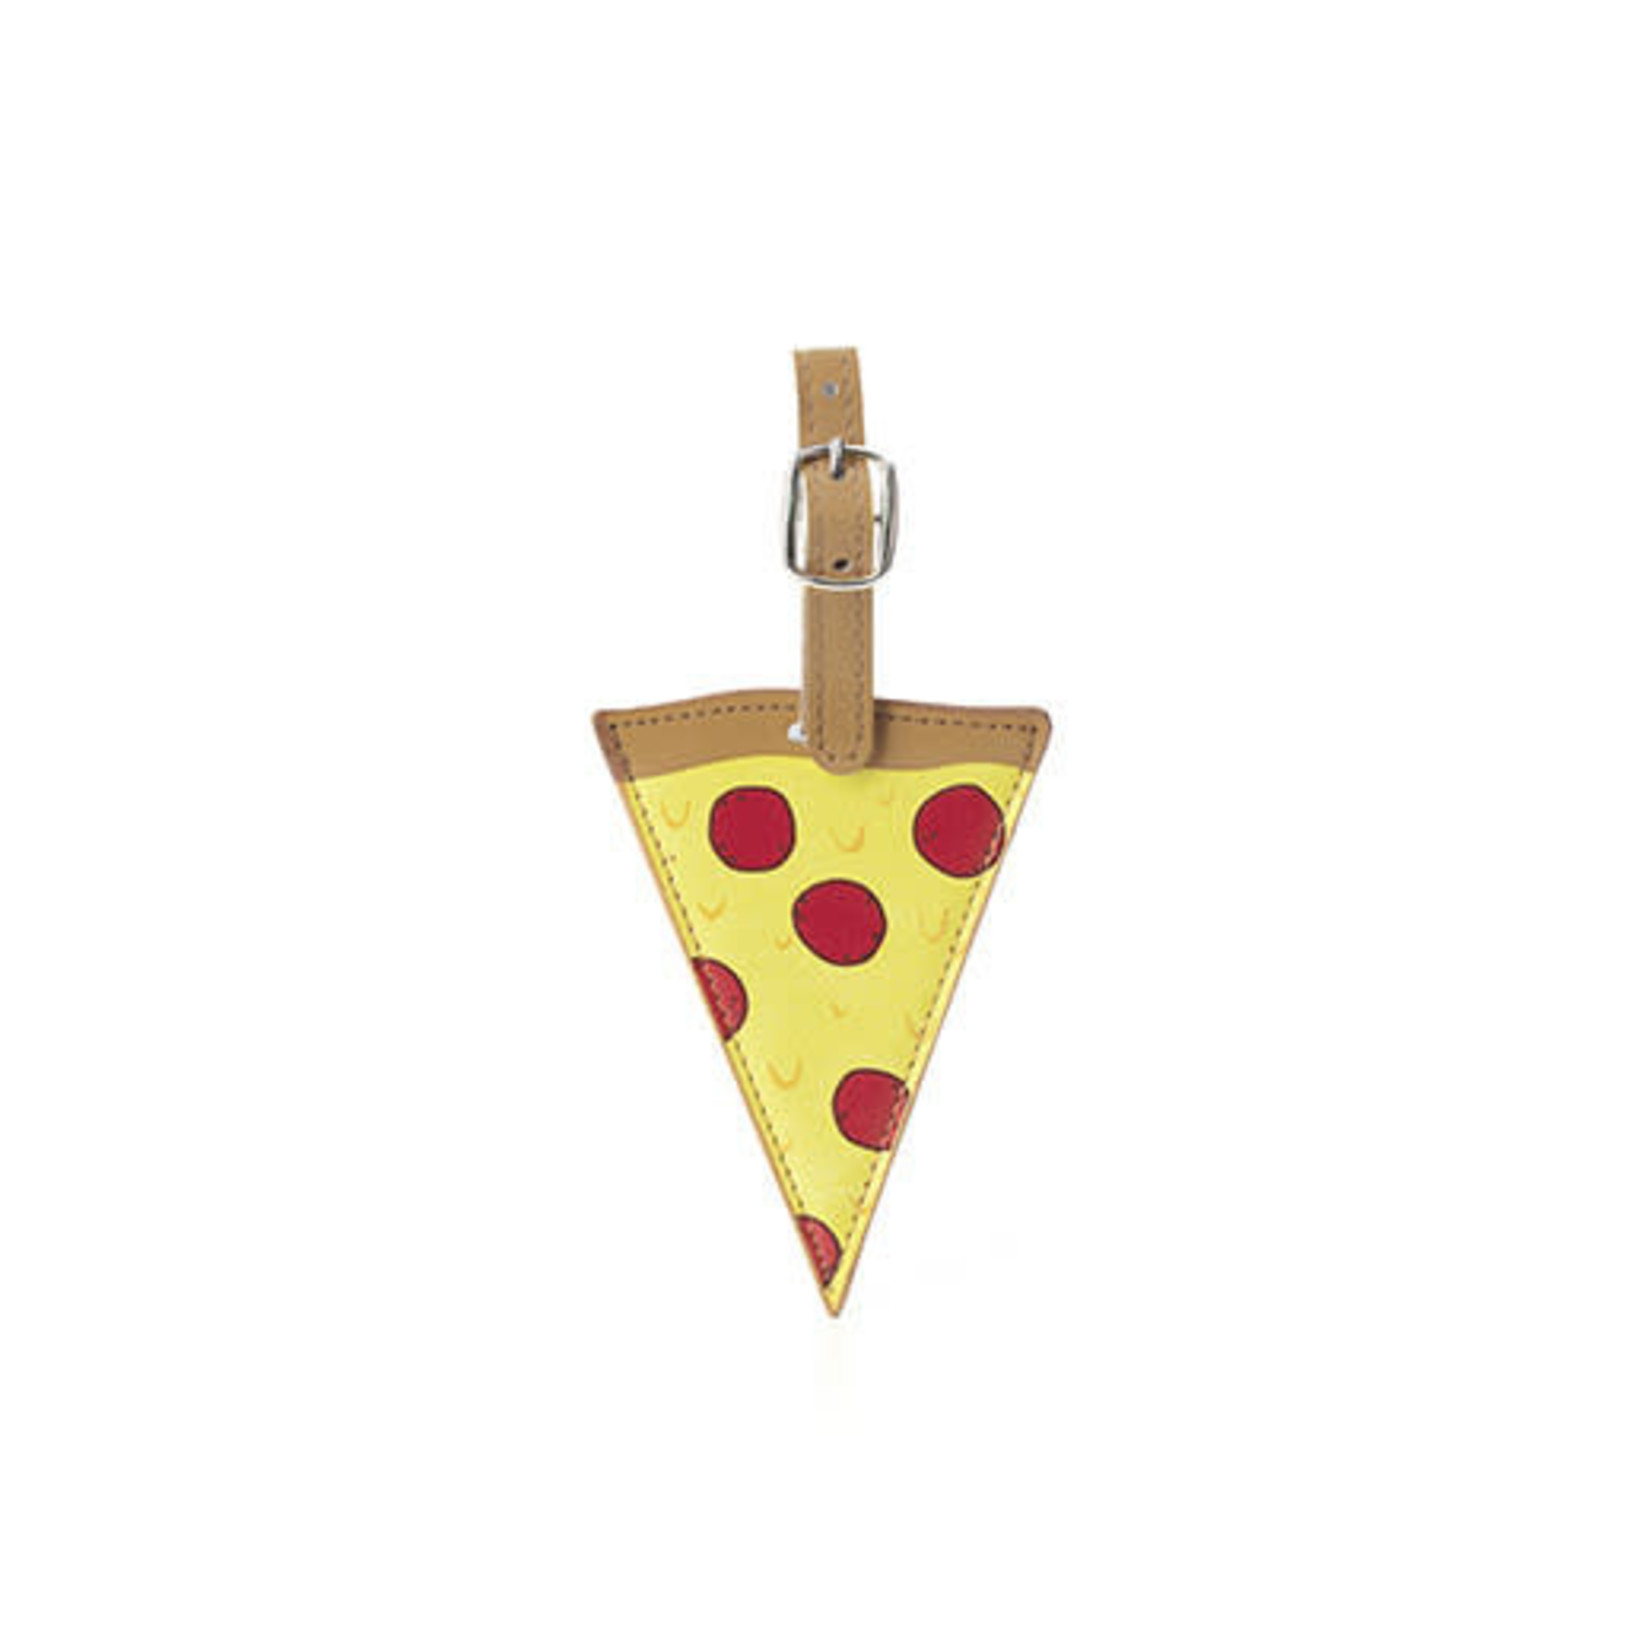 Kikkerland Pizza Luggage Tag